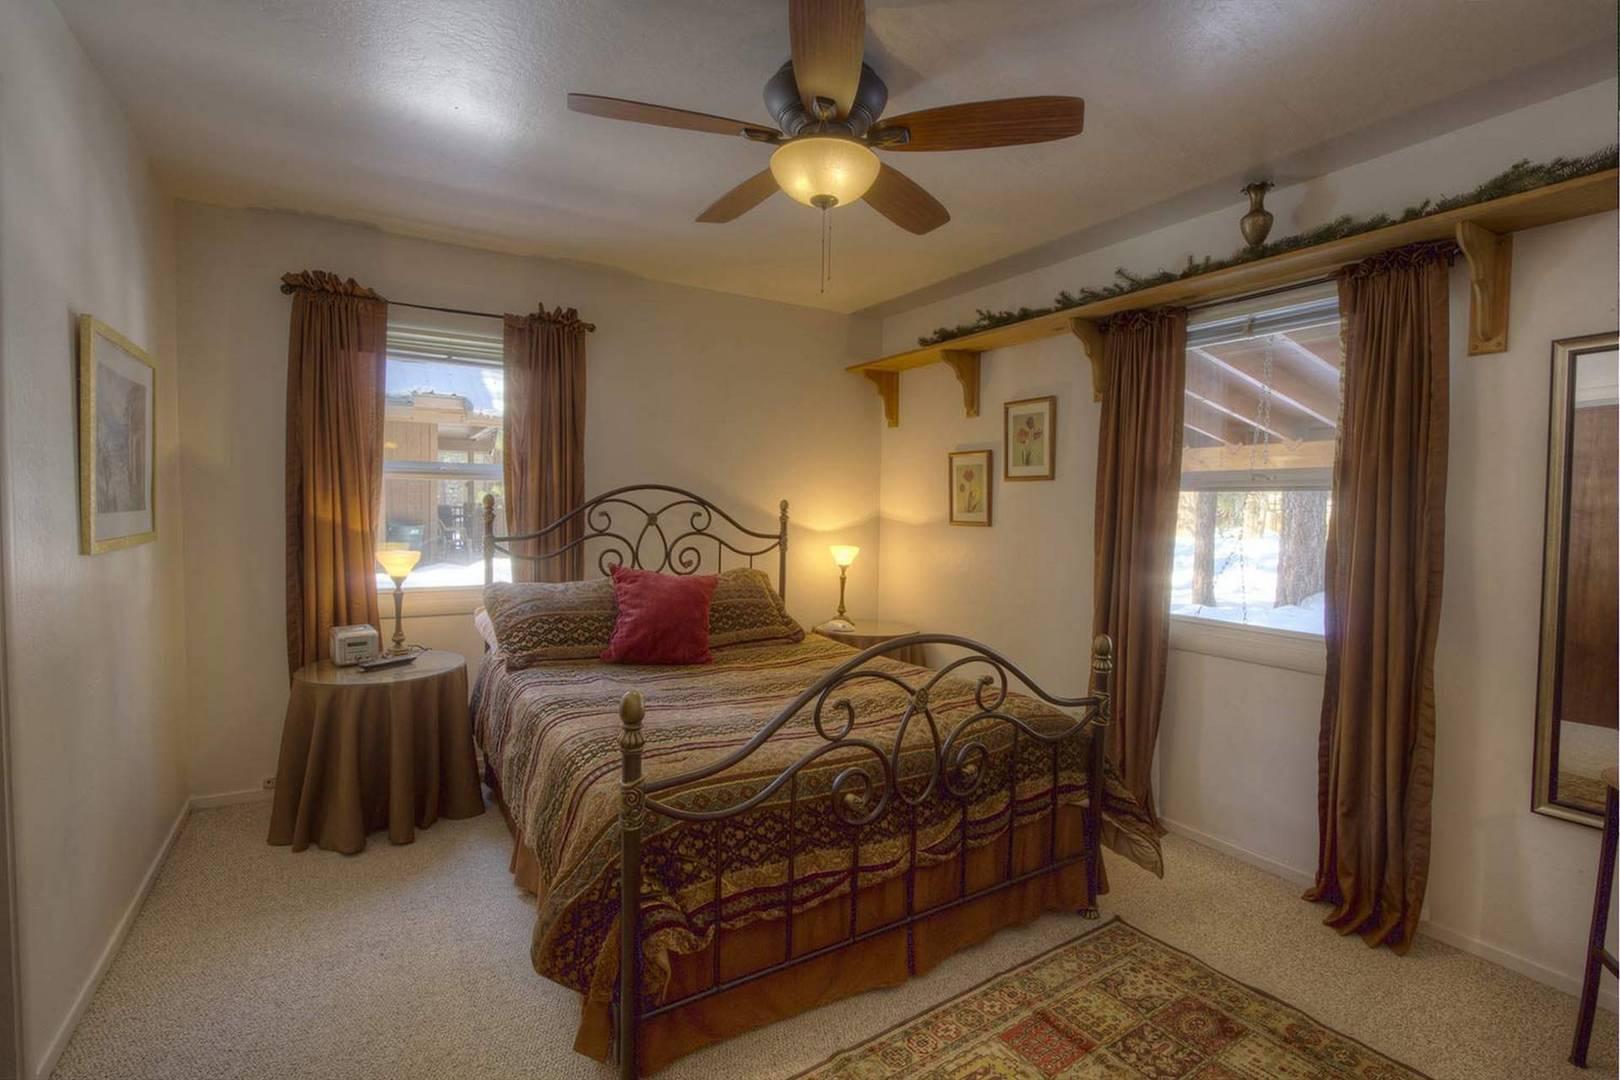 cyh0840 bedroom